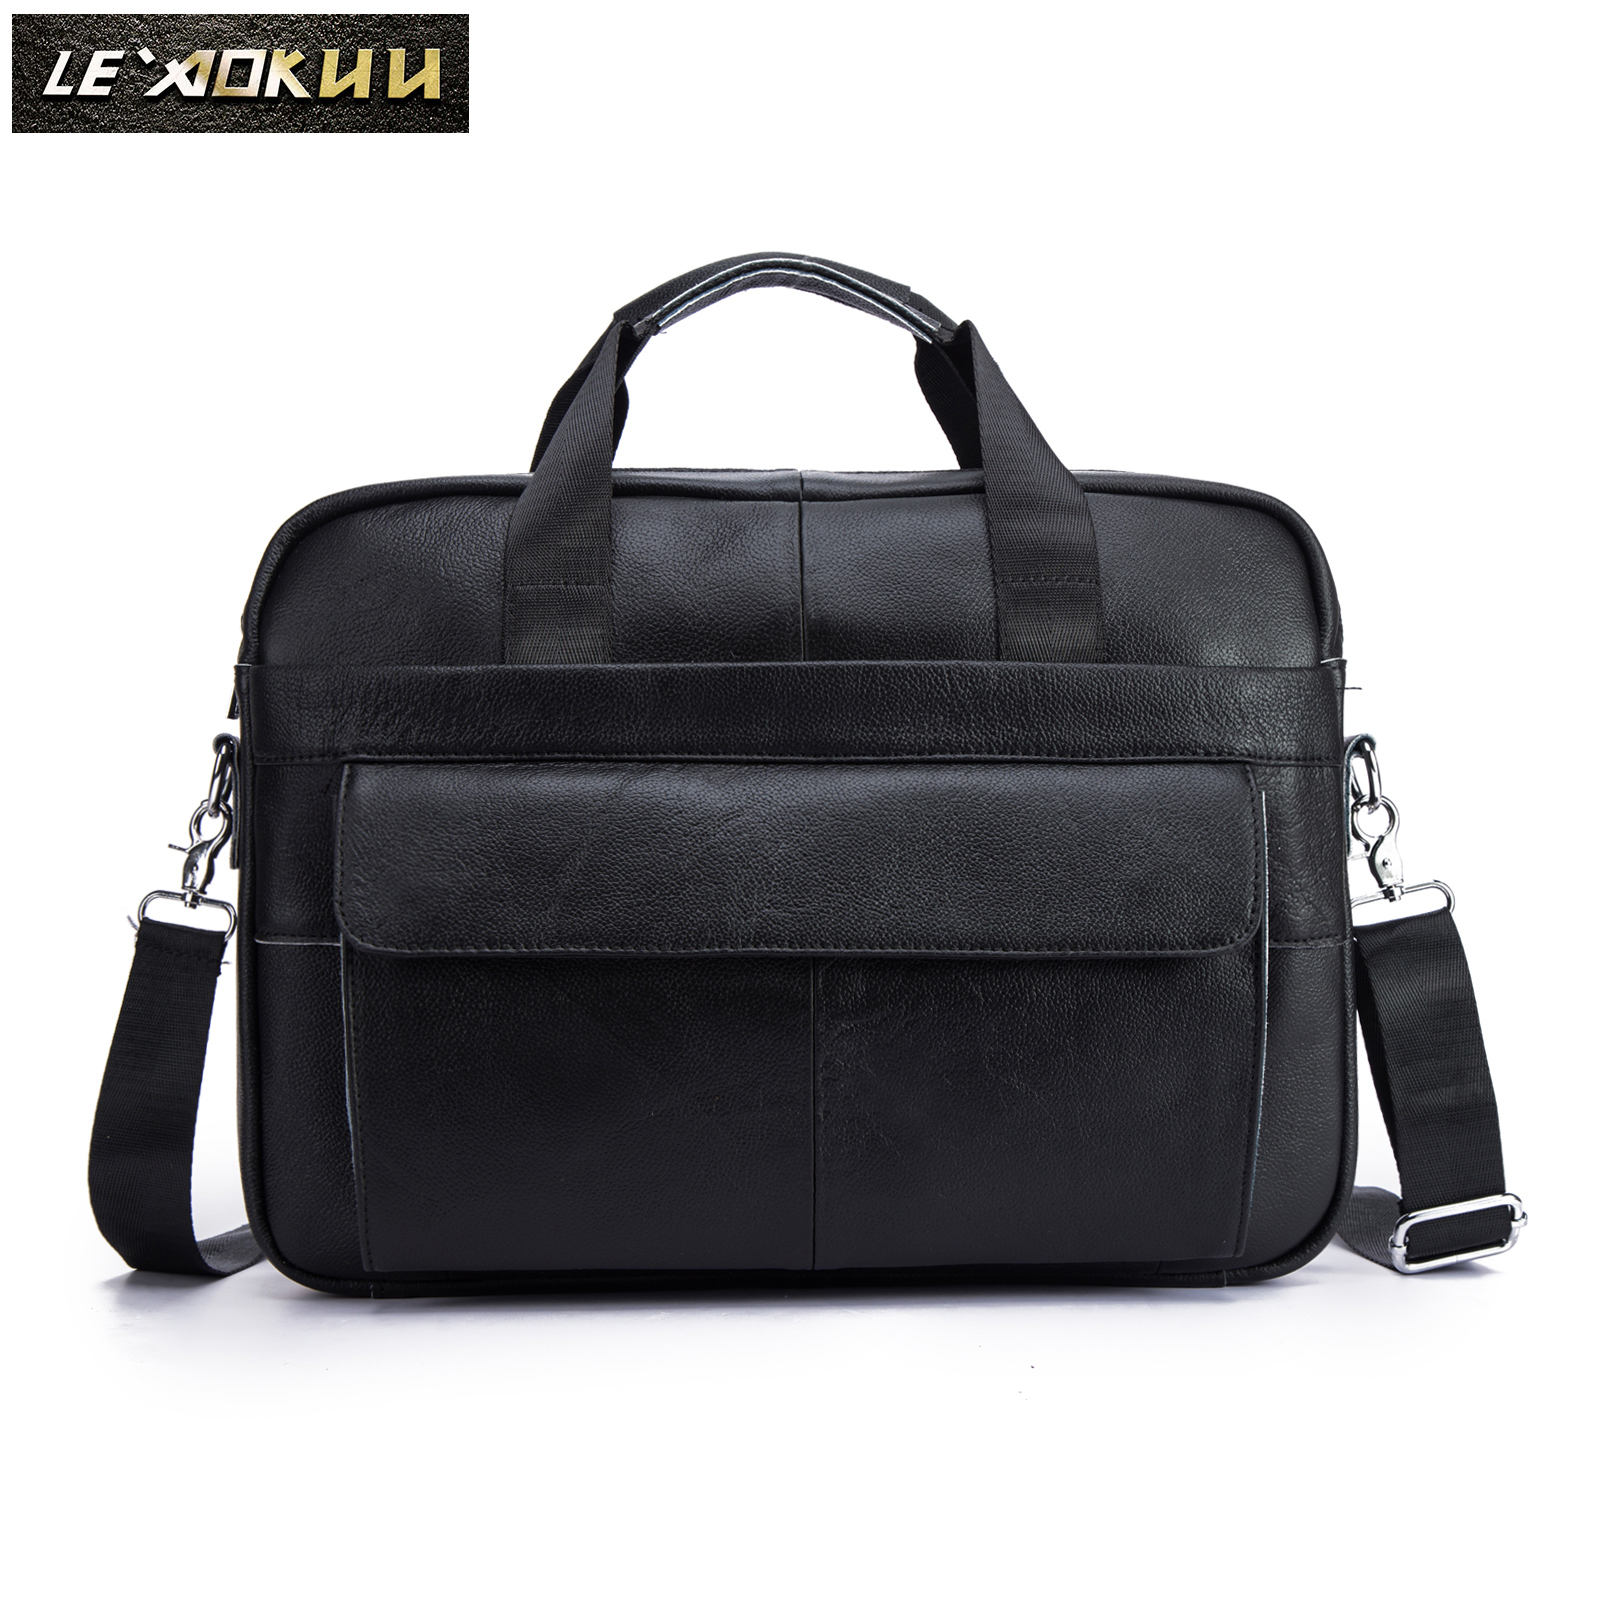 Men Quality Leather Retro Fashion Travel Briefcase Business 15.6